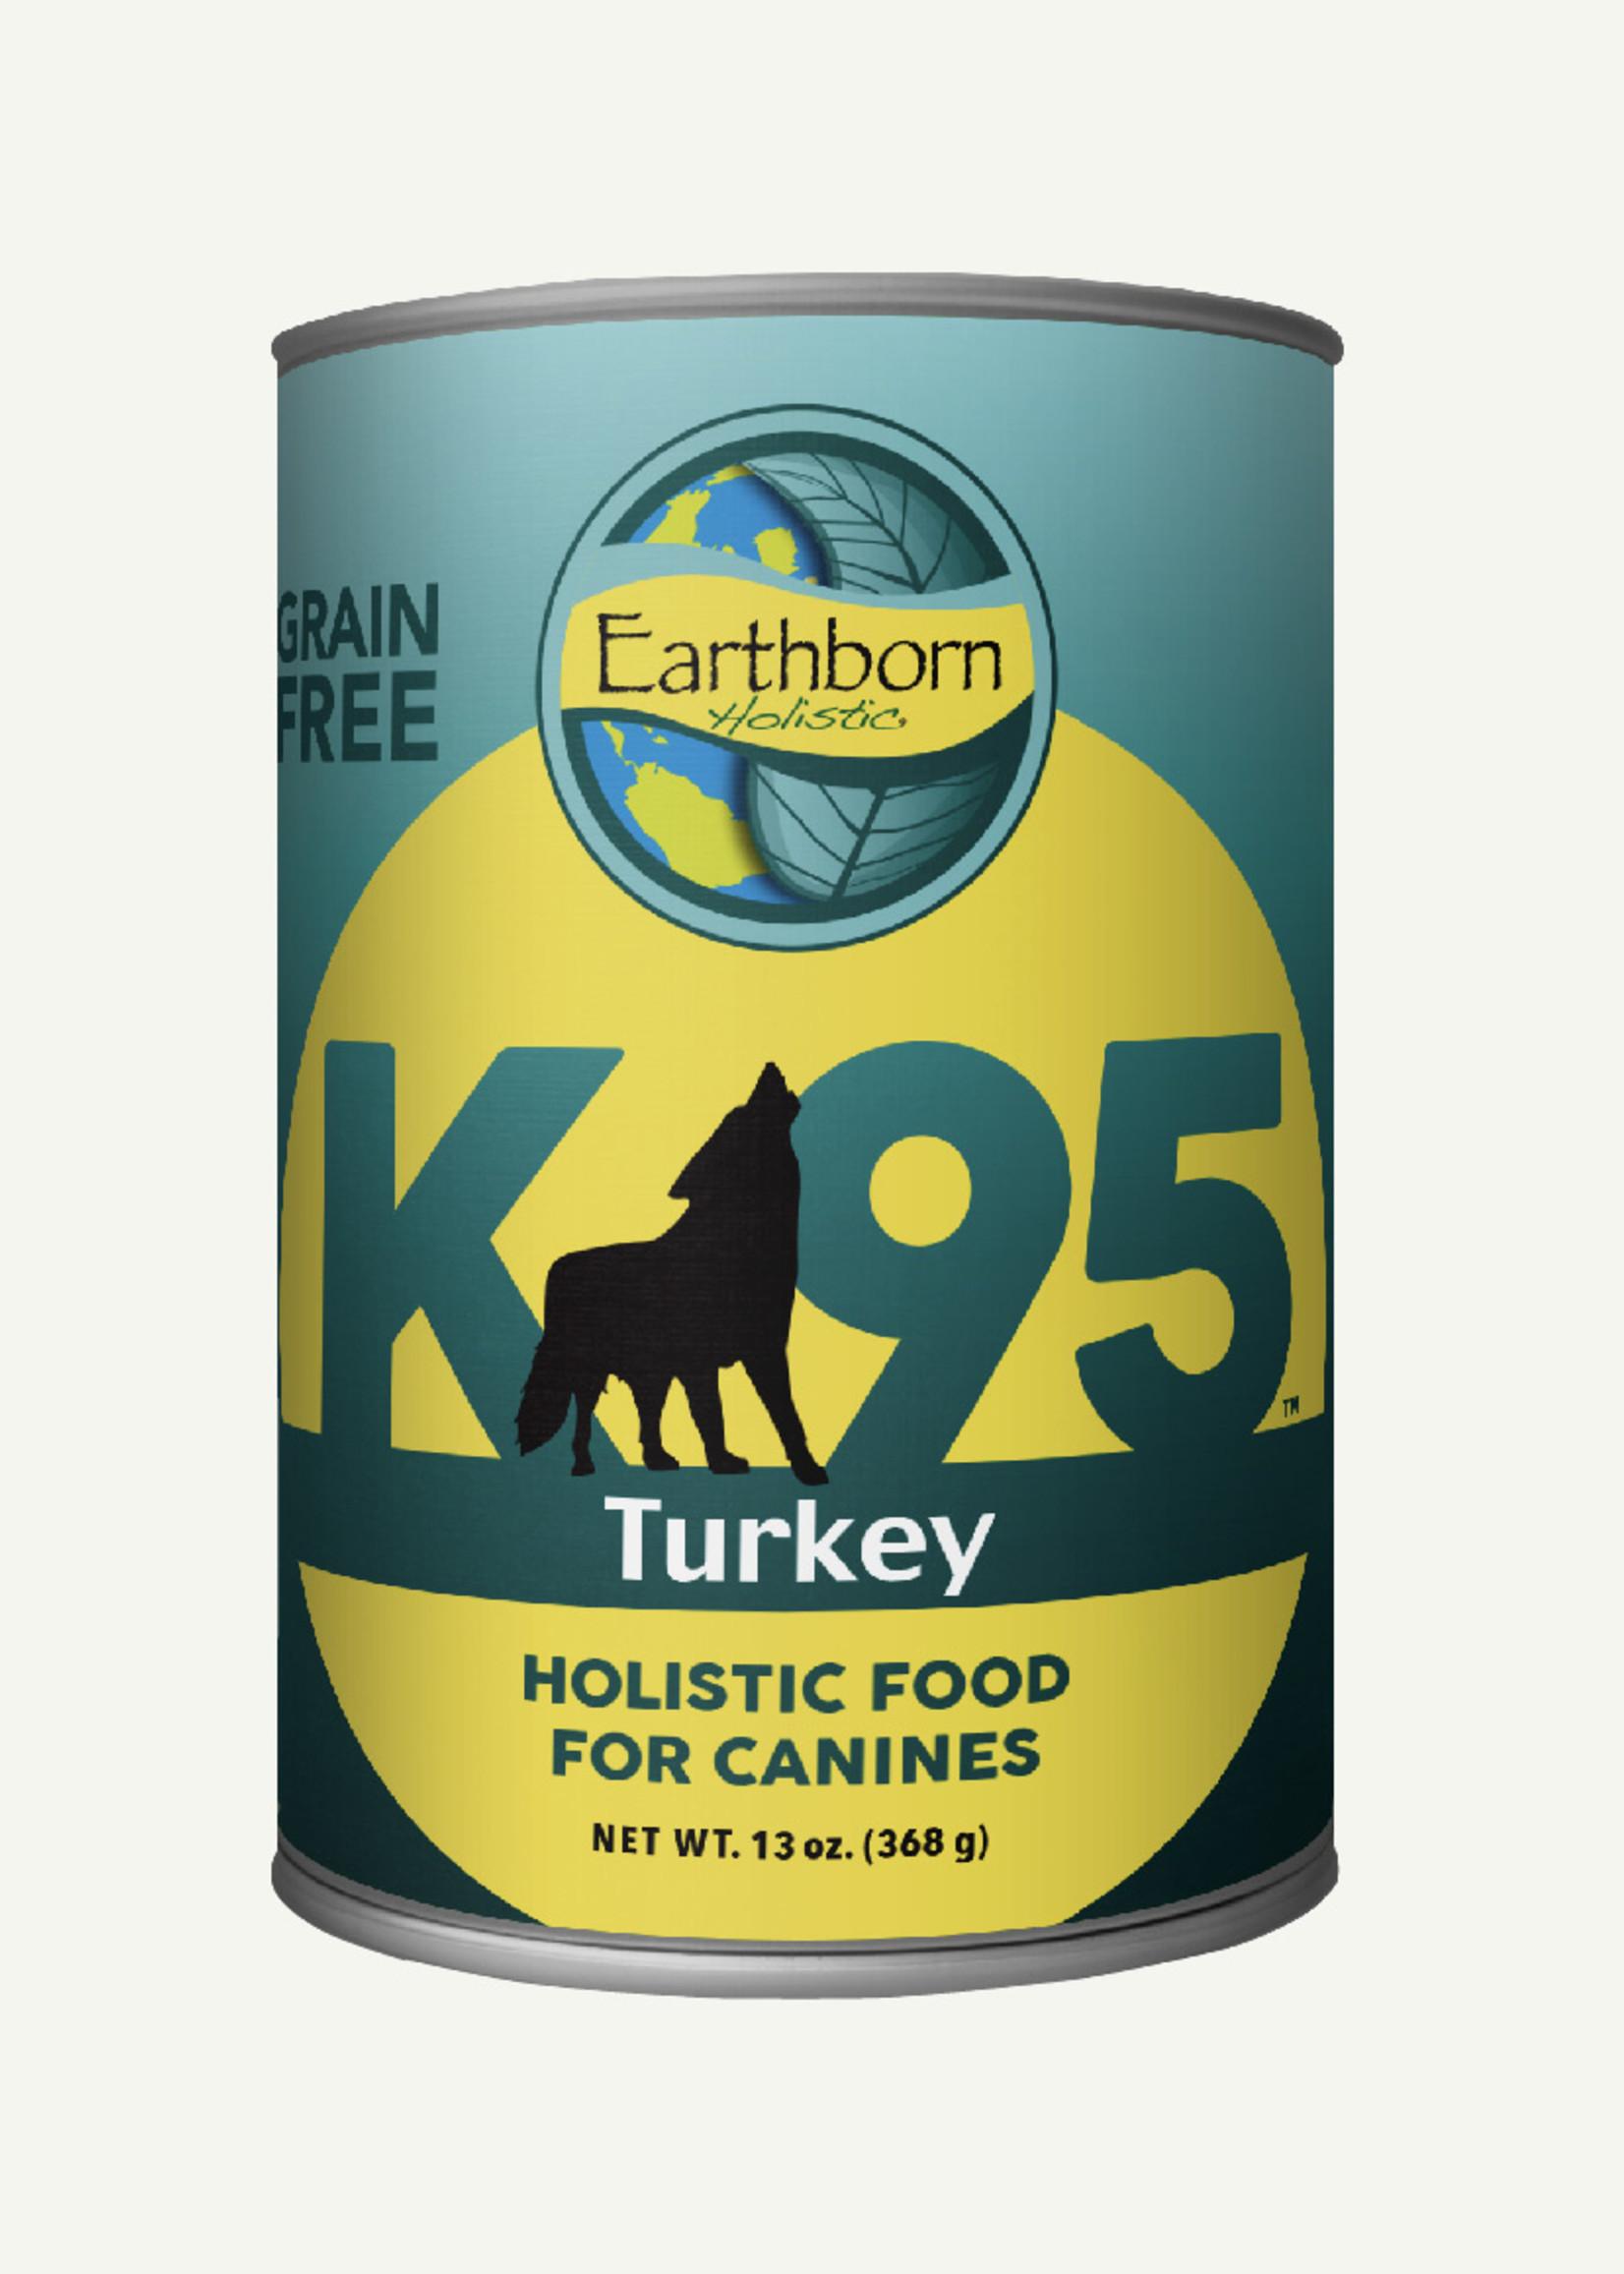 Earthborn Earthborn K95 Turkey Grain Free 13 oz Case